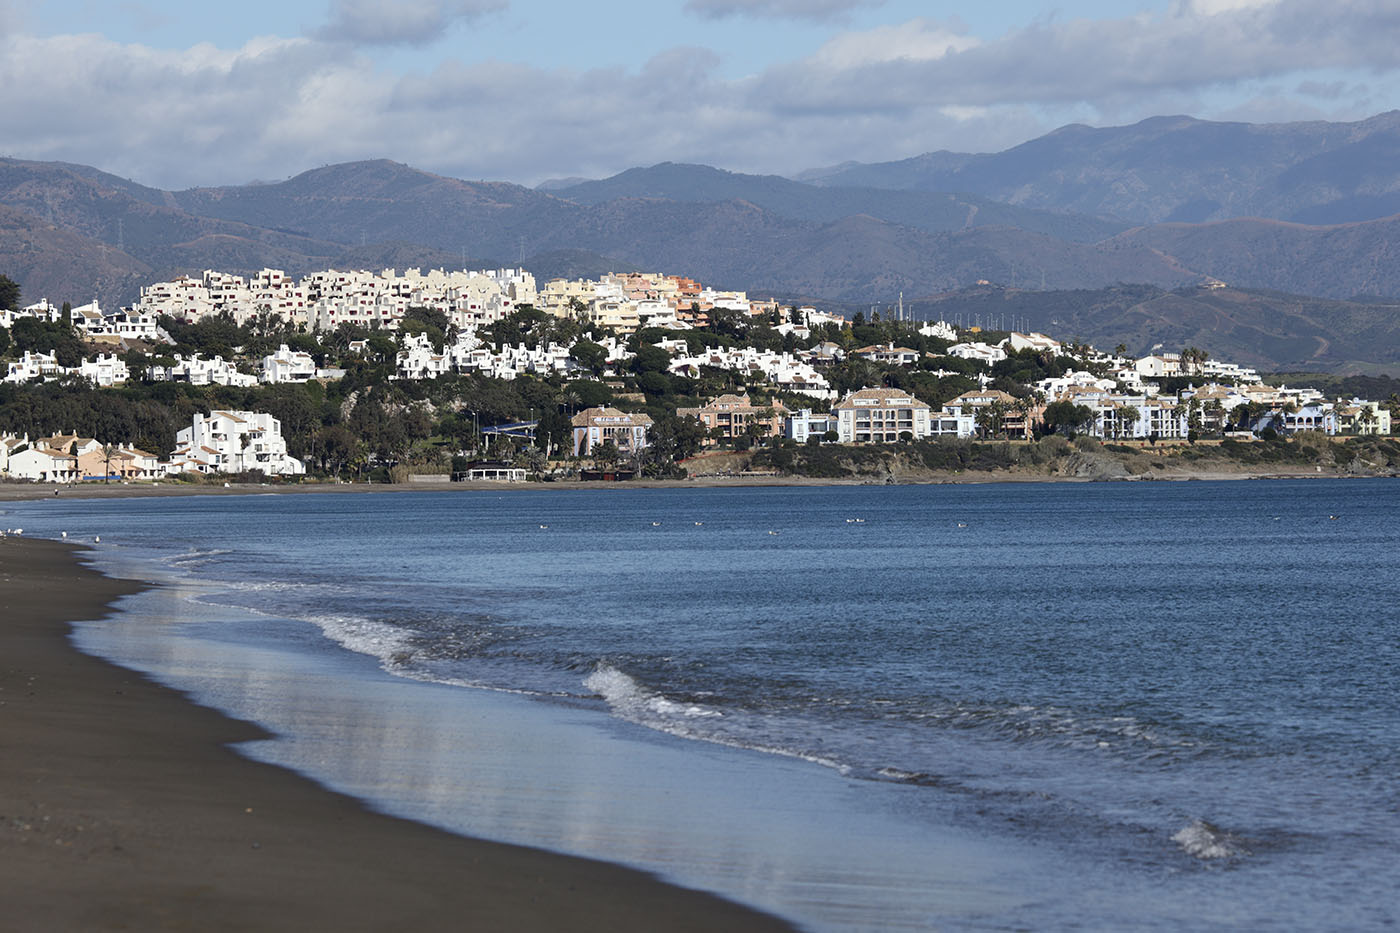 Playas de Casares